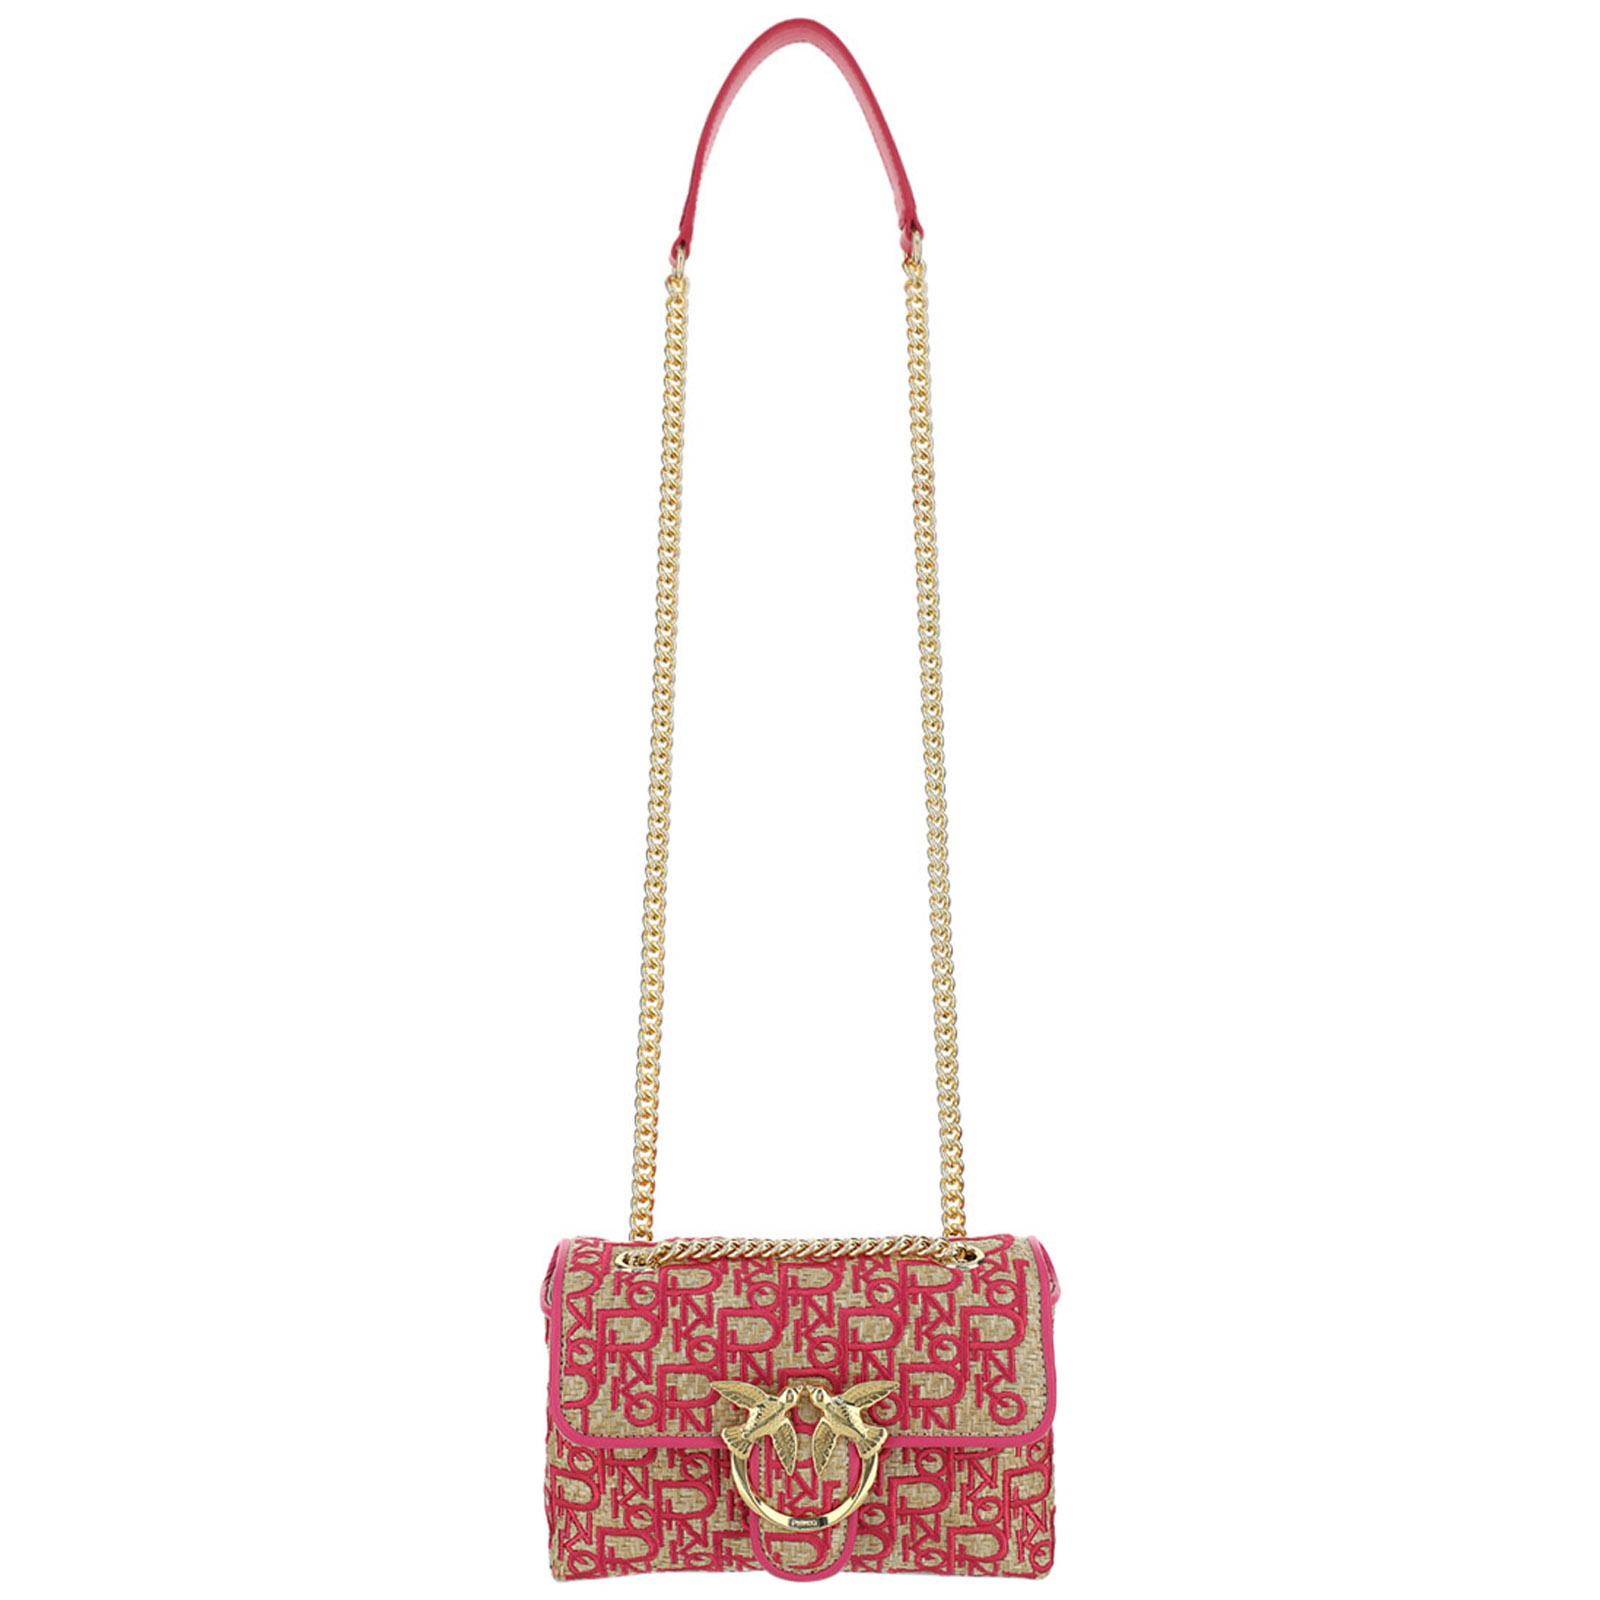 Pinko Leathers WOMEN'S LEATHER SHOULDER BAG LOVE PUFF MINI